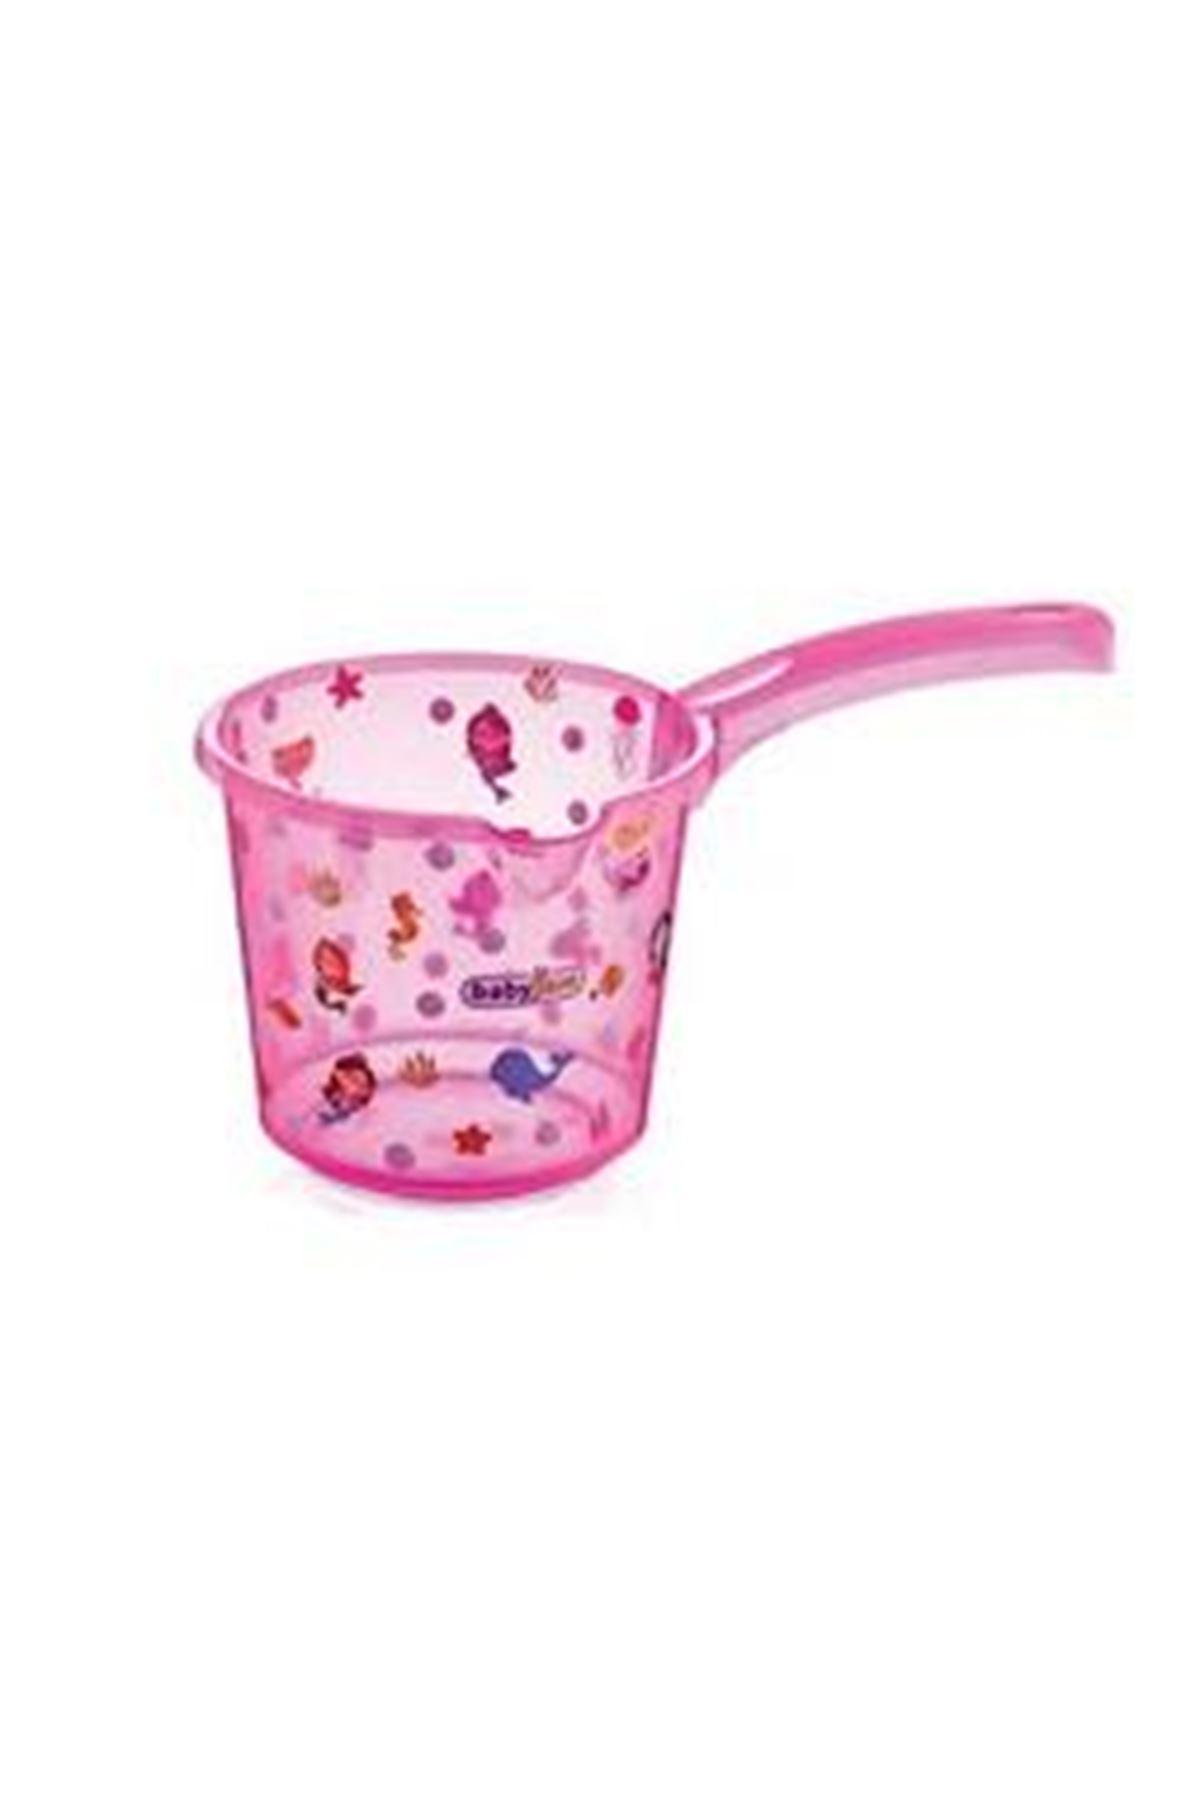 BabyJem Bebek Banyo Maşrapası Şeffaf Desenli 400 Pembe